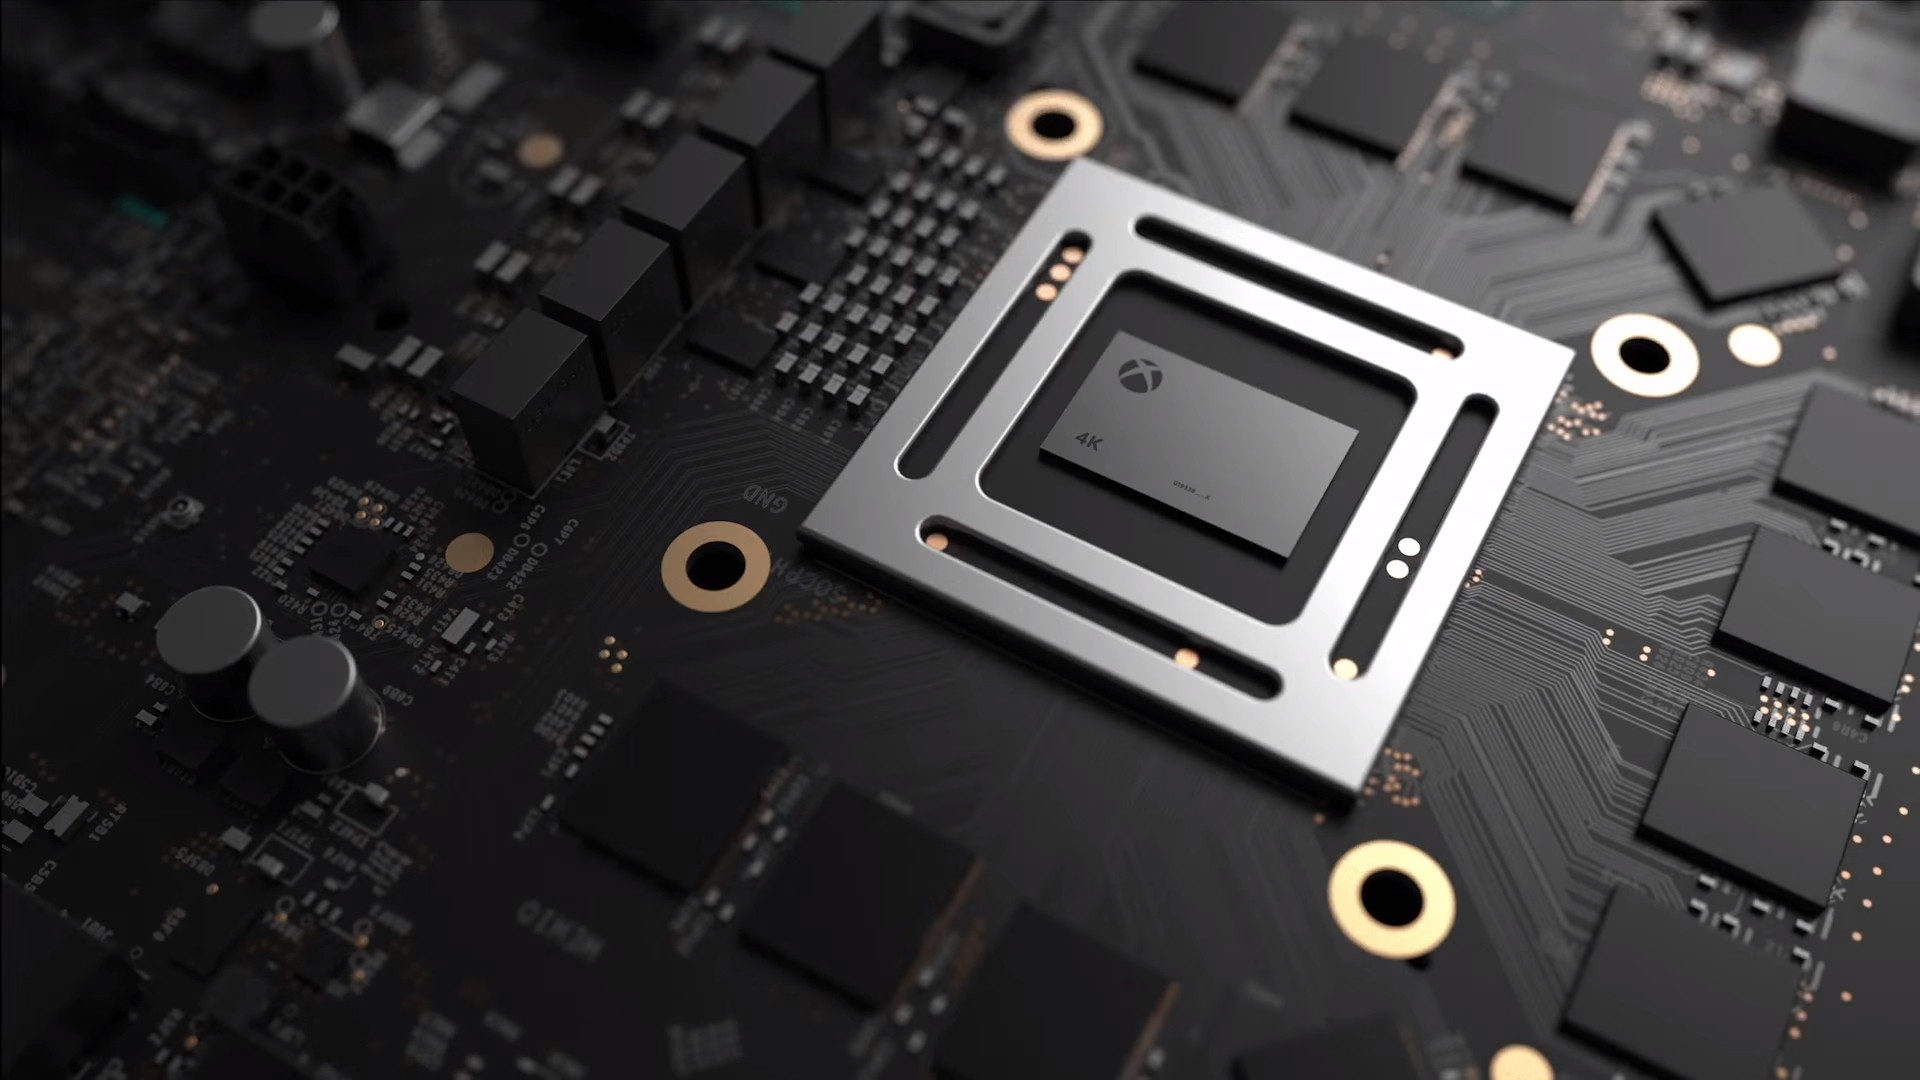 Xbox Scorpio rumored to run some PC games at native 4K